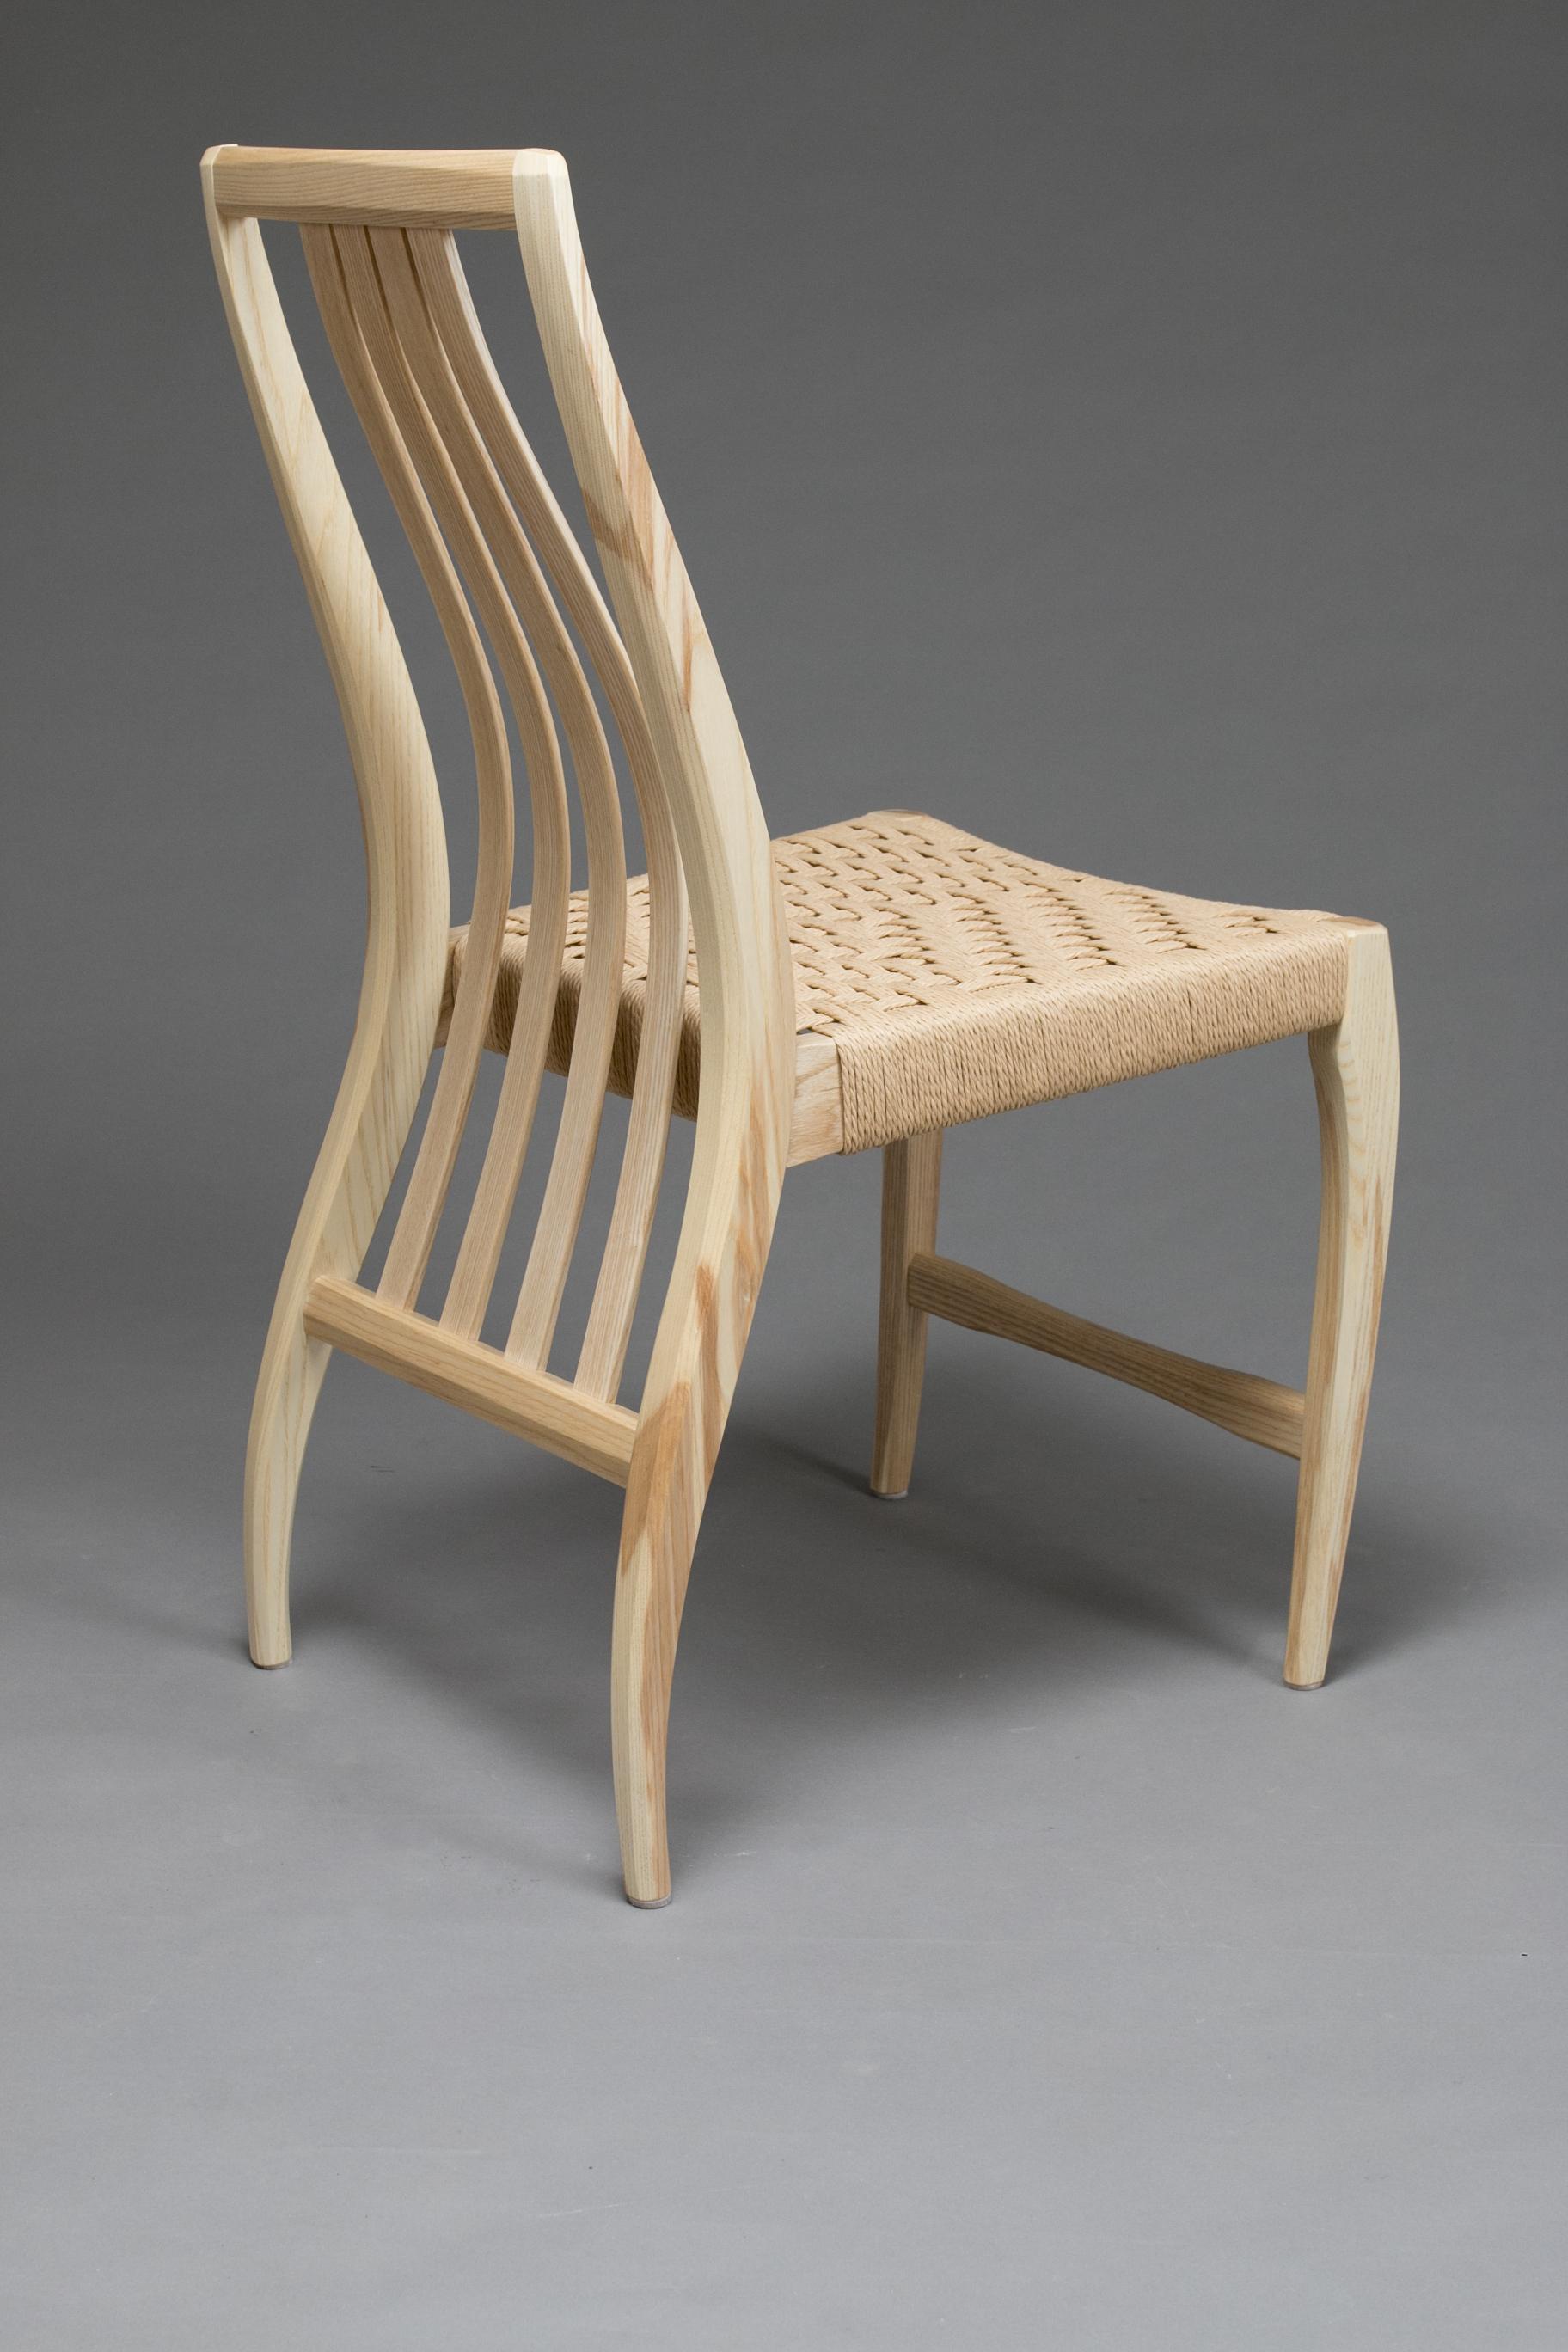 Helen Hamilton - Chair Design